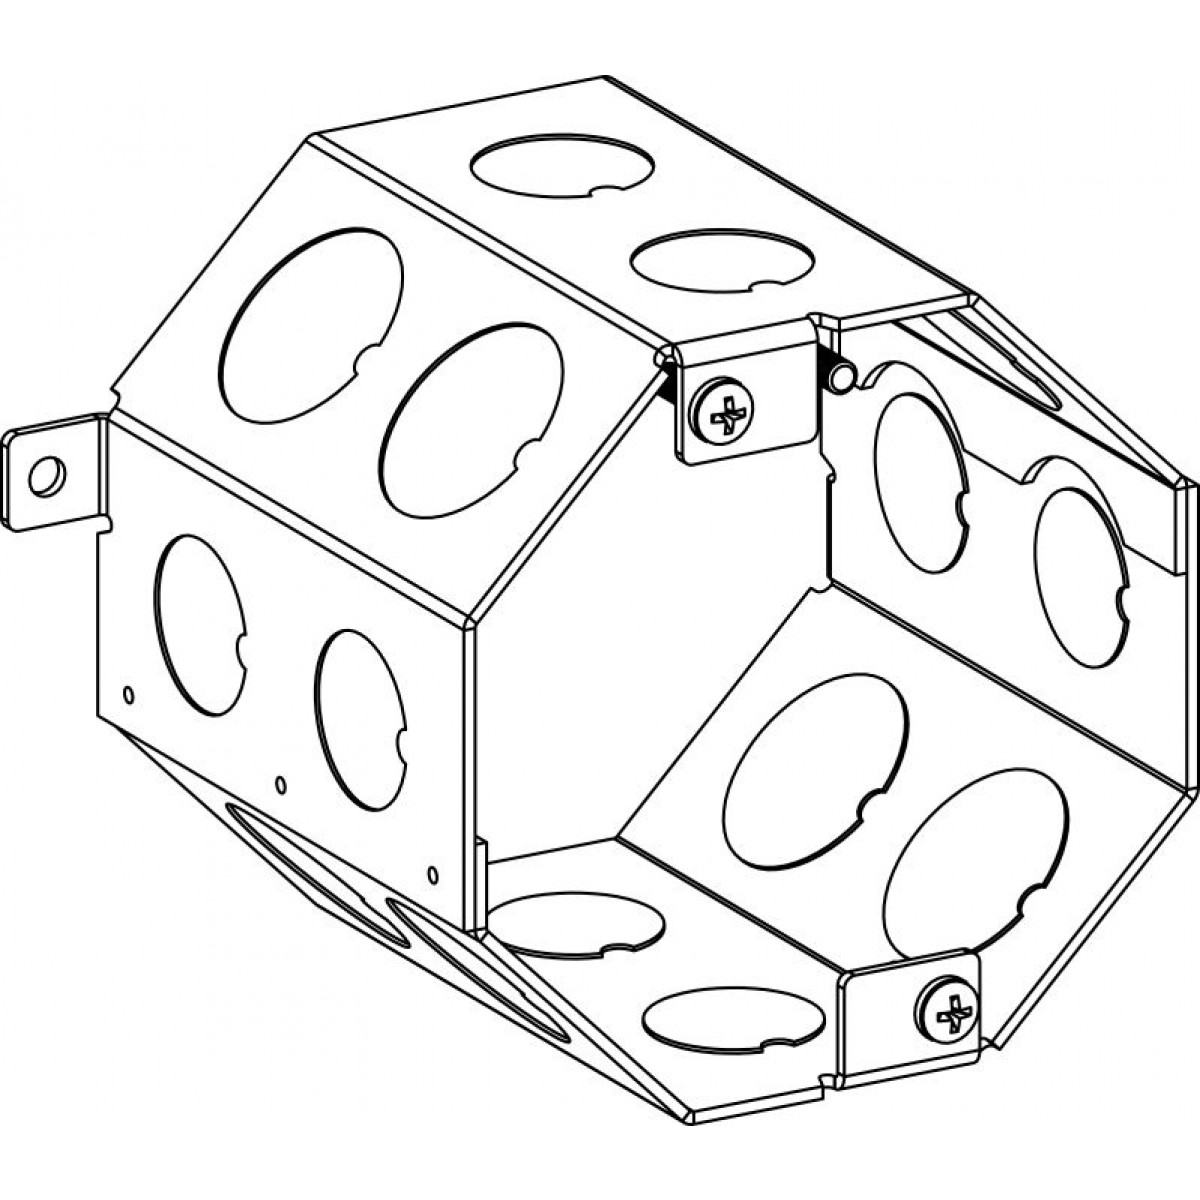 35cb - concrete boxes - electrical junction boxes